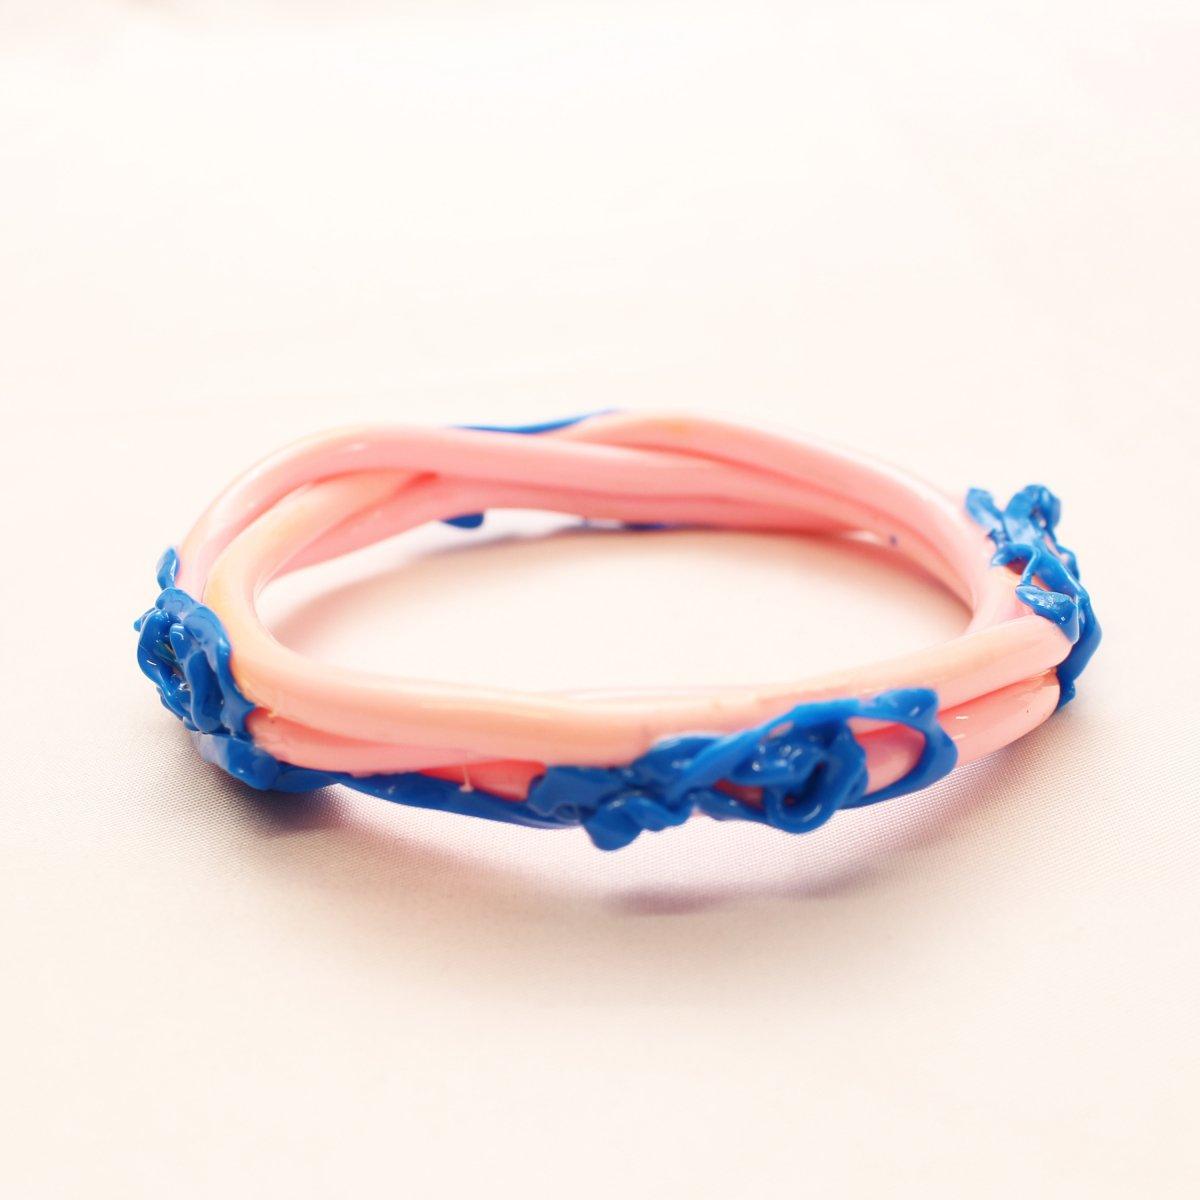 wrist bands【PINK×BLUE】